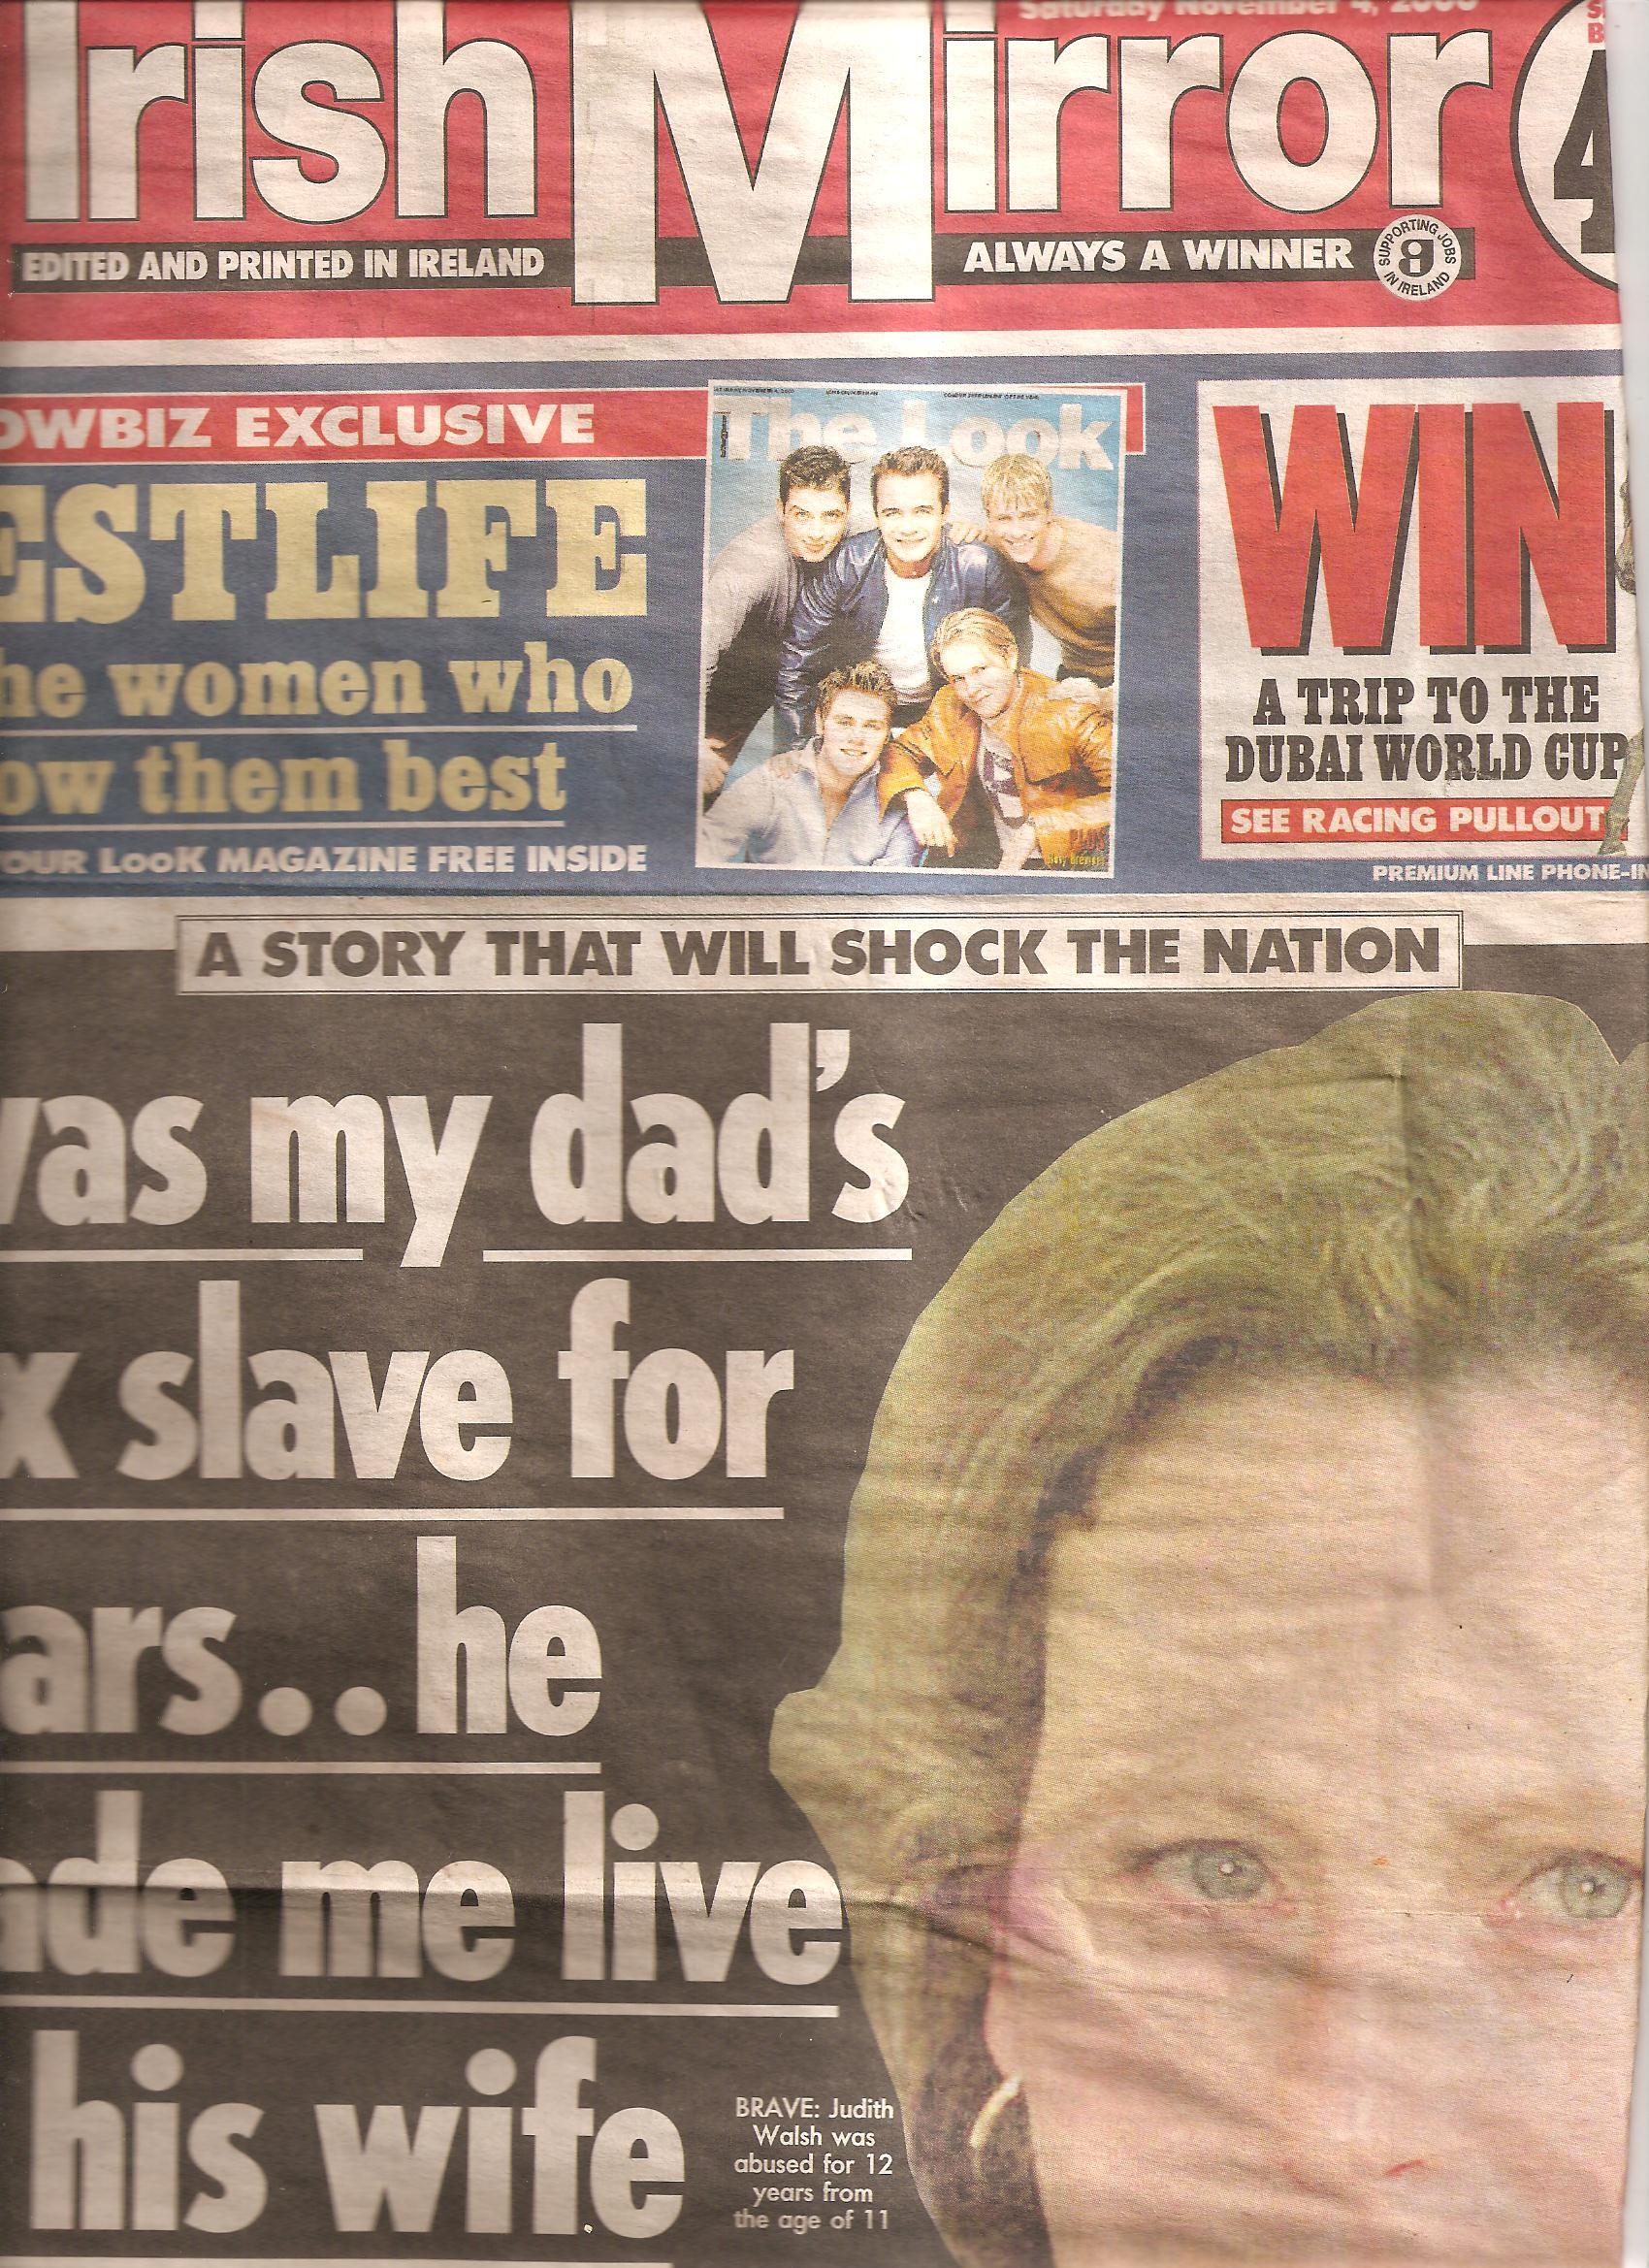 Irish Mirror page 1